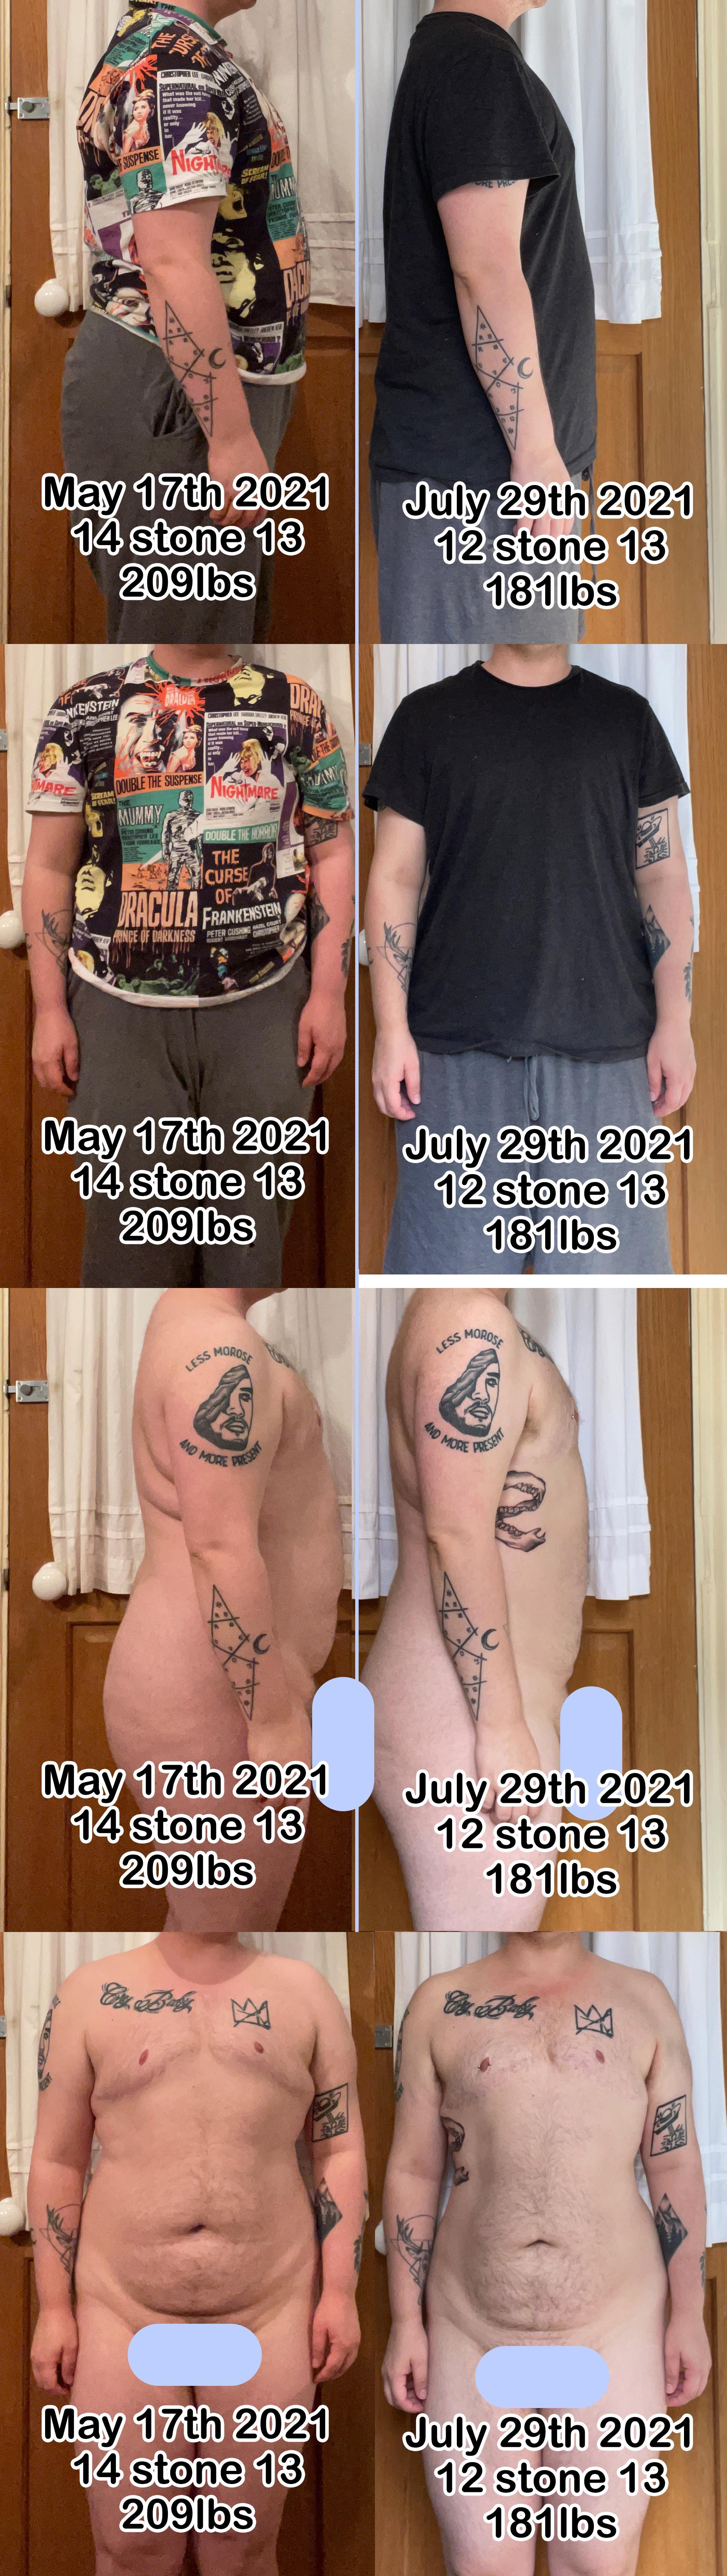 5 feet 5 Male Progress Pics of 28 lbs Weight Loss 209 lbs to 181 lbs